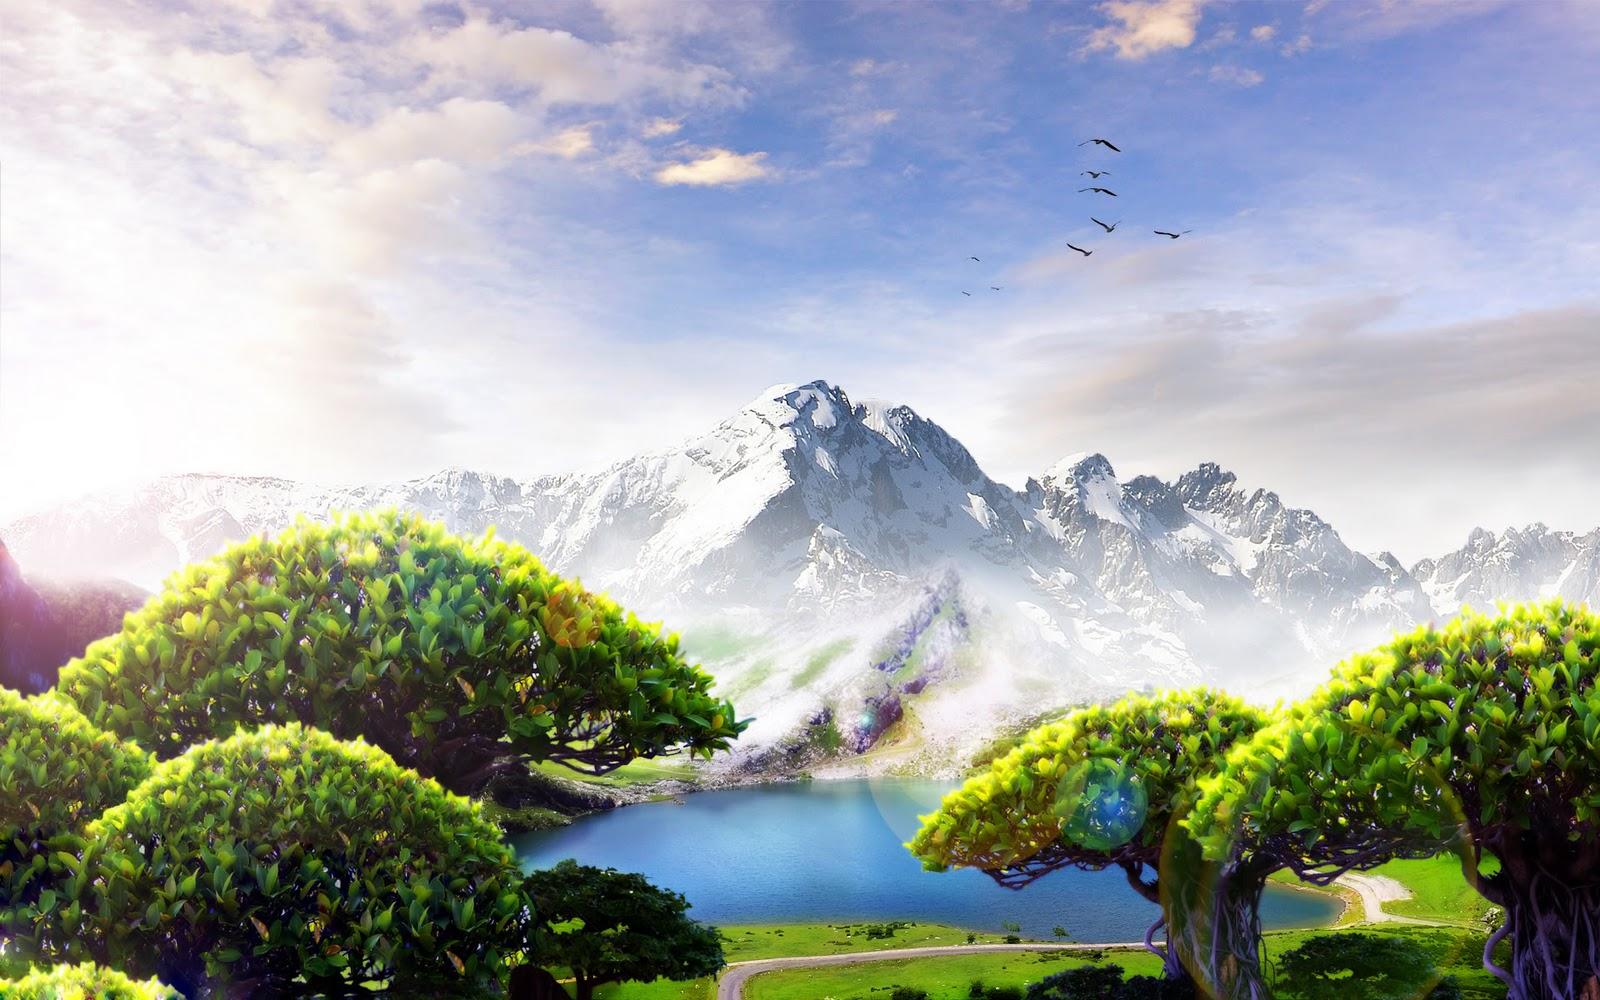 Wallpapers hd free scenery forest etc - Fantasy scenery wallpaper ...